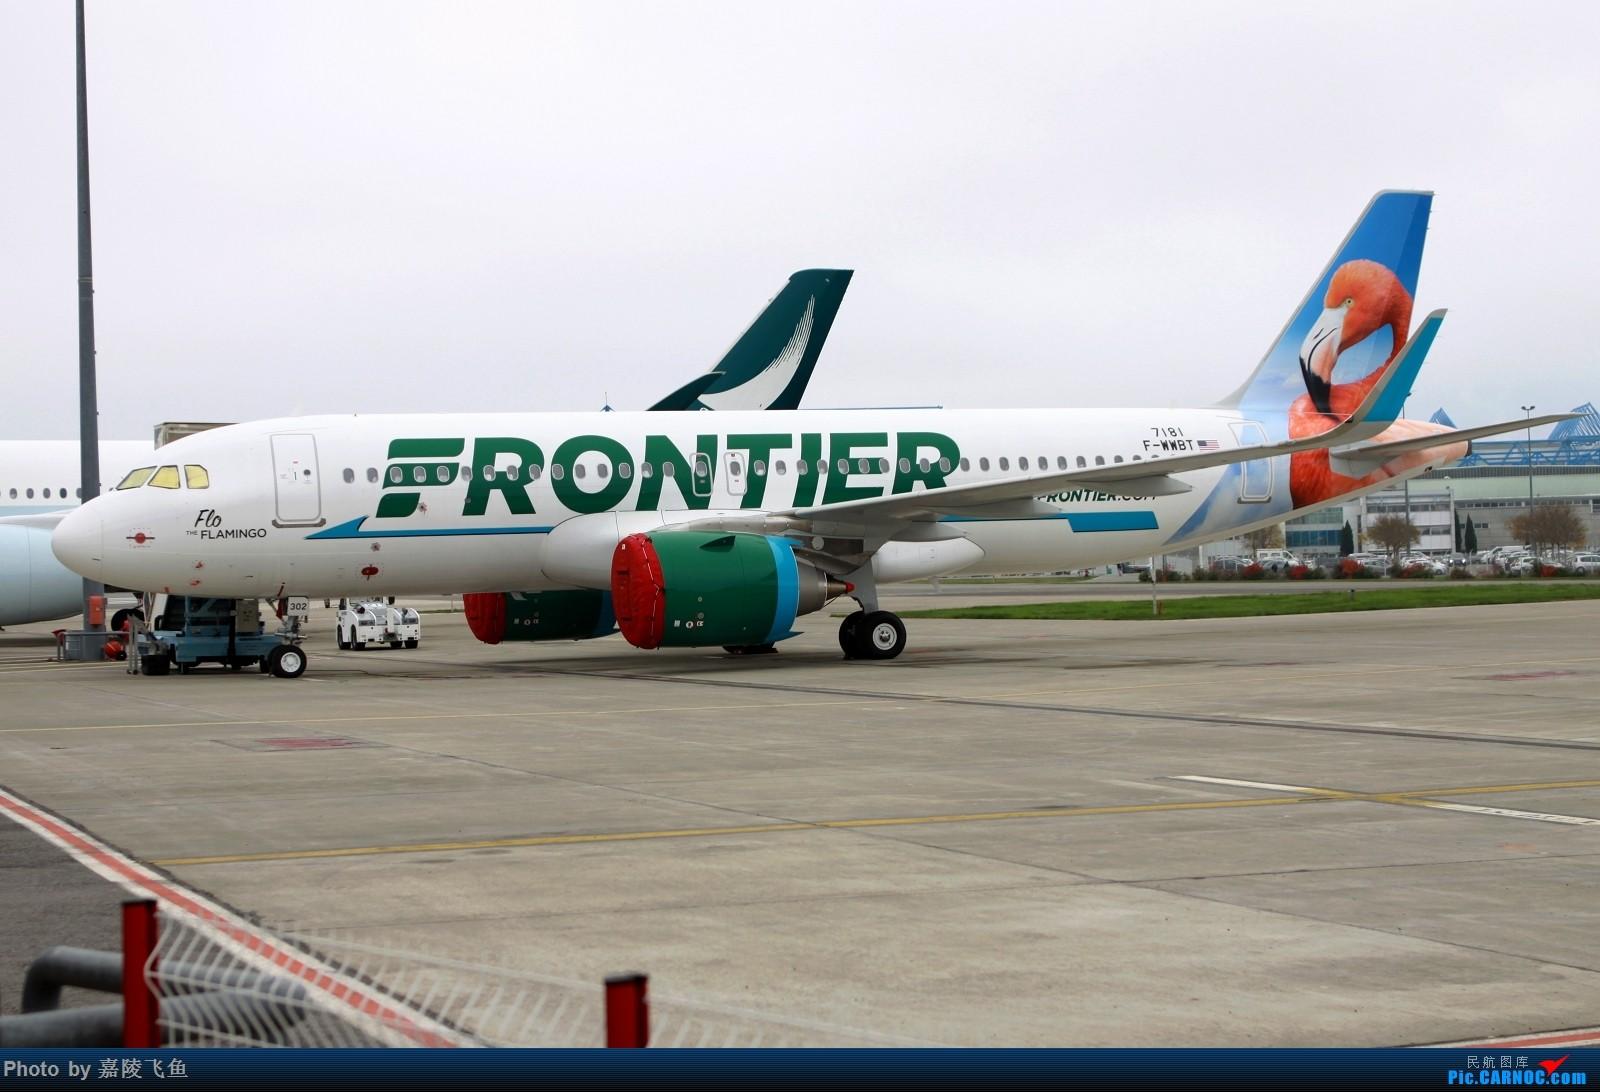 Re:[原创]忠实 边疆 阿拉斯加还有其他 AIRBUS A320NEO F-WWBT 法国图卢兹布拉尼亚克机场